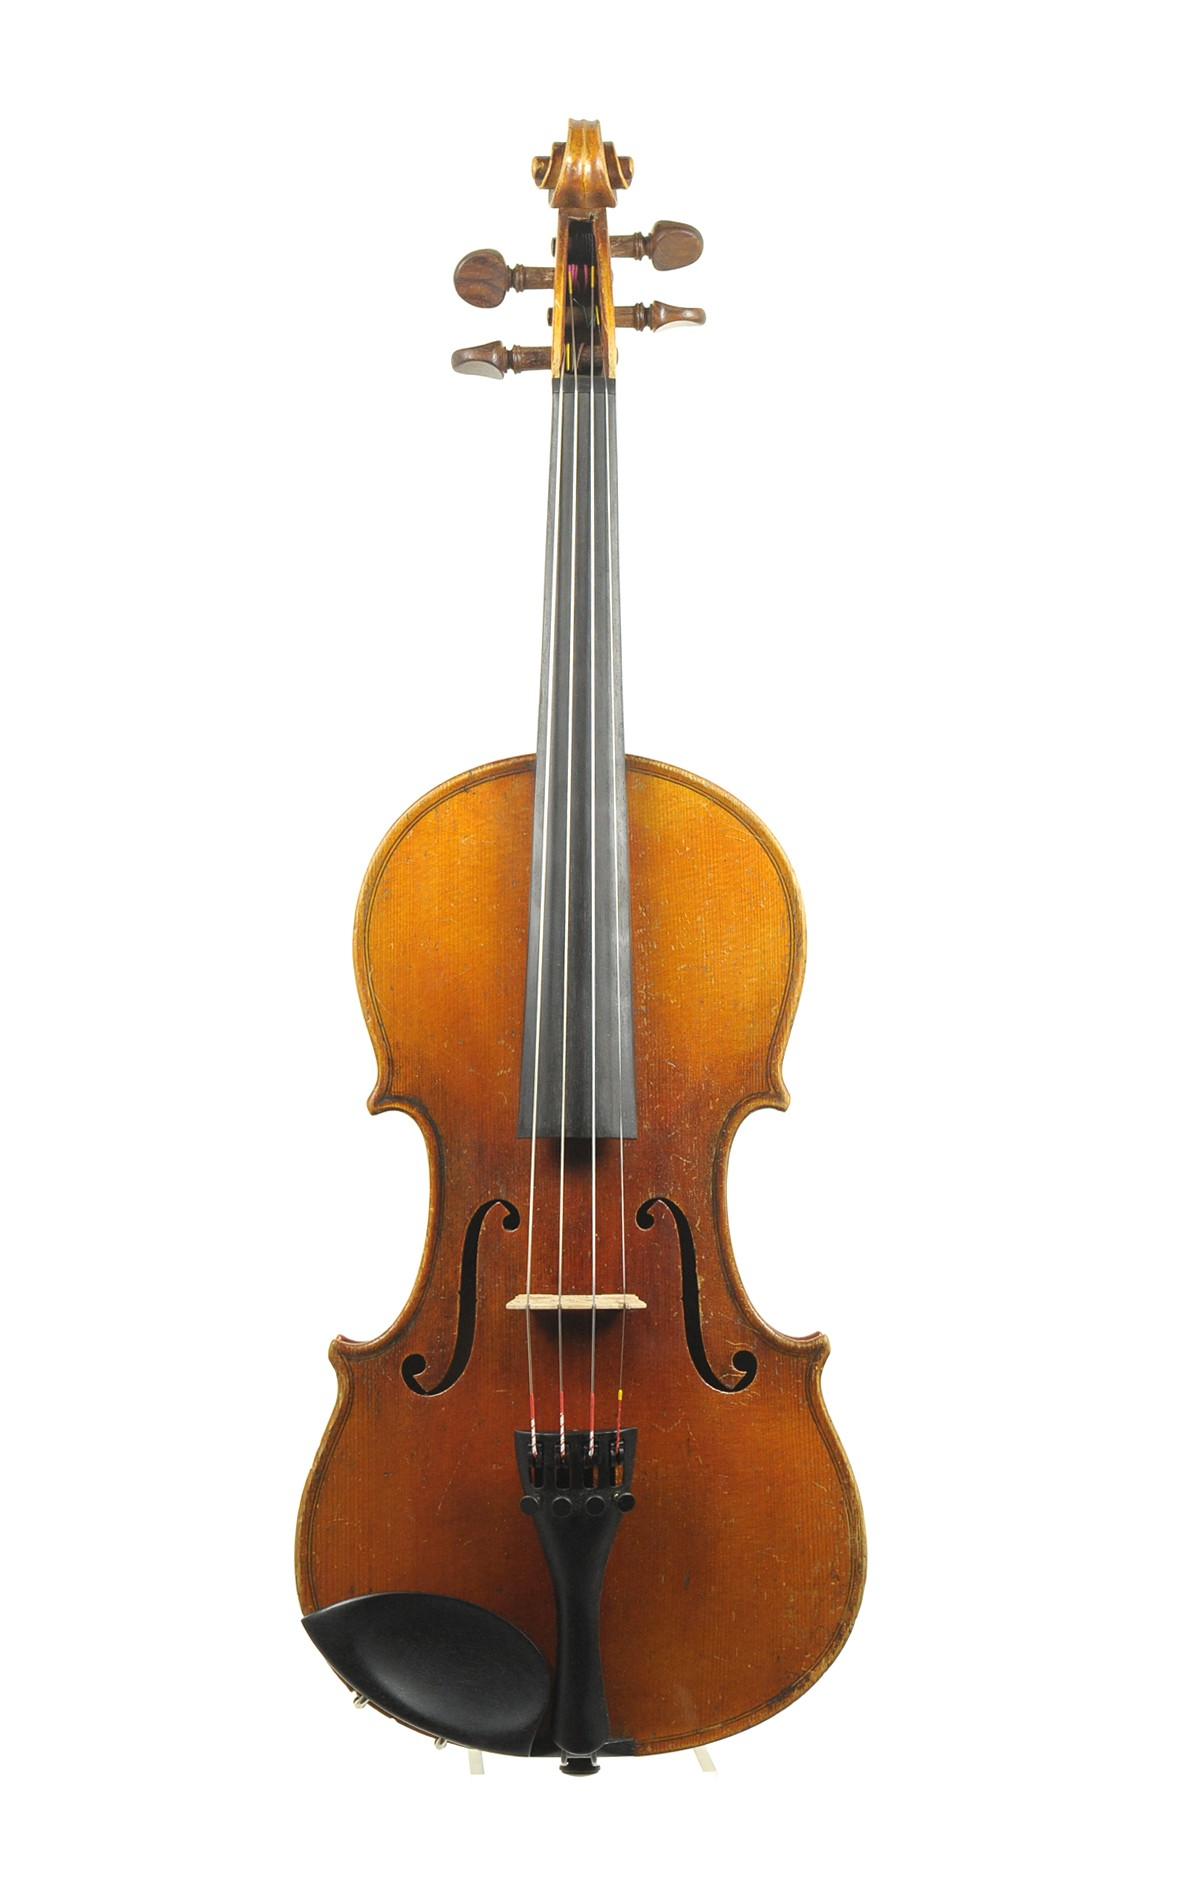 3/4 - powerful old German 3/4 violin, prob. A. C. Glier - top